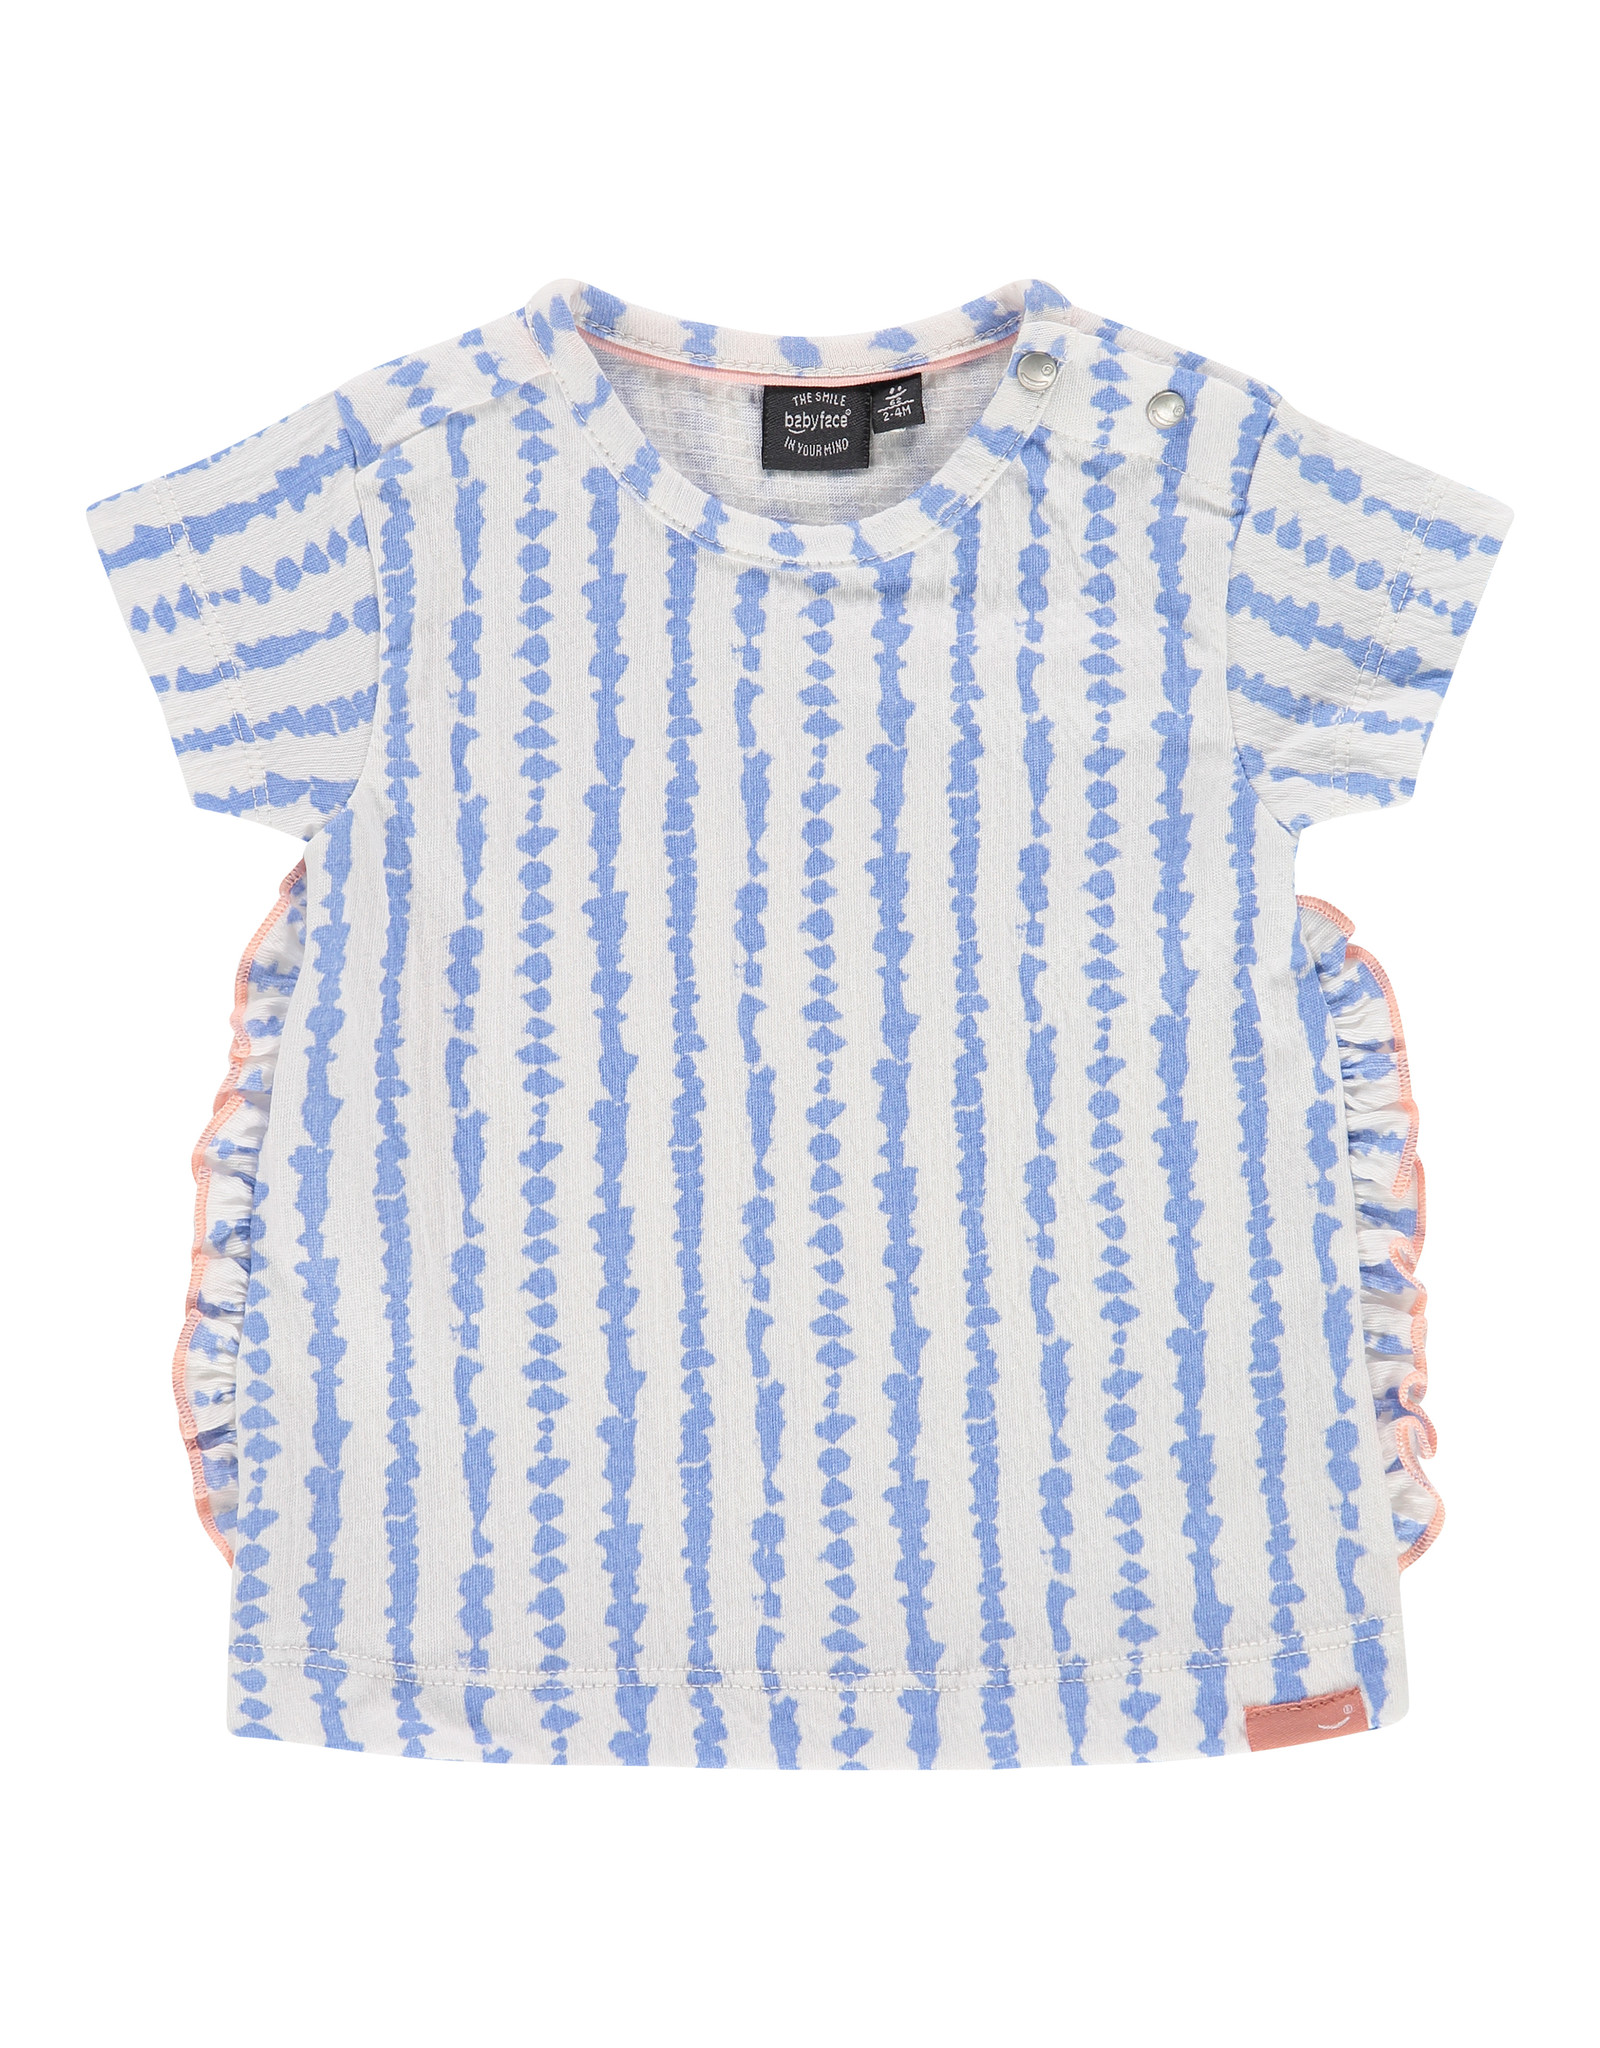 Babyface baby girls t-shirt short sleeve, lavender blue, NWB21228648